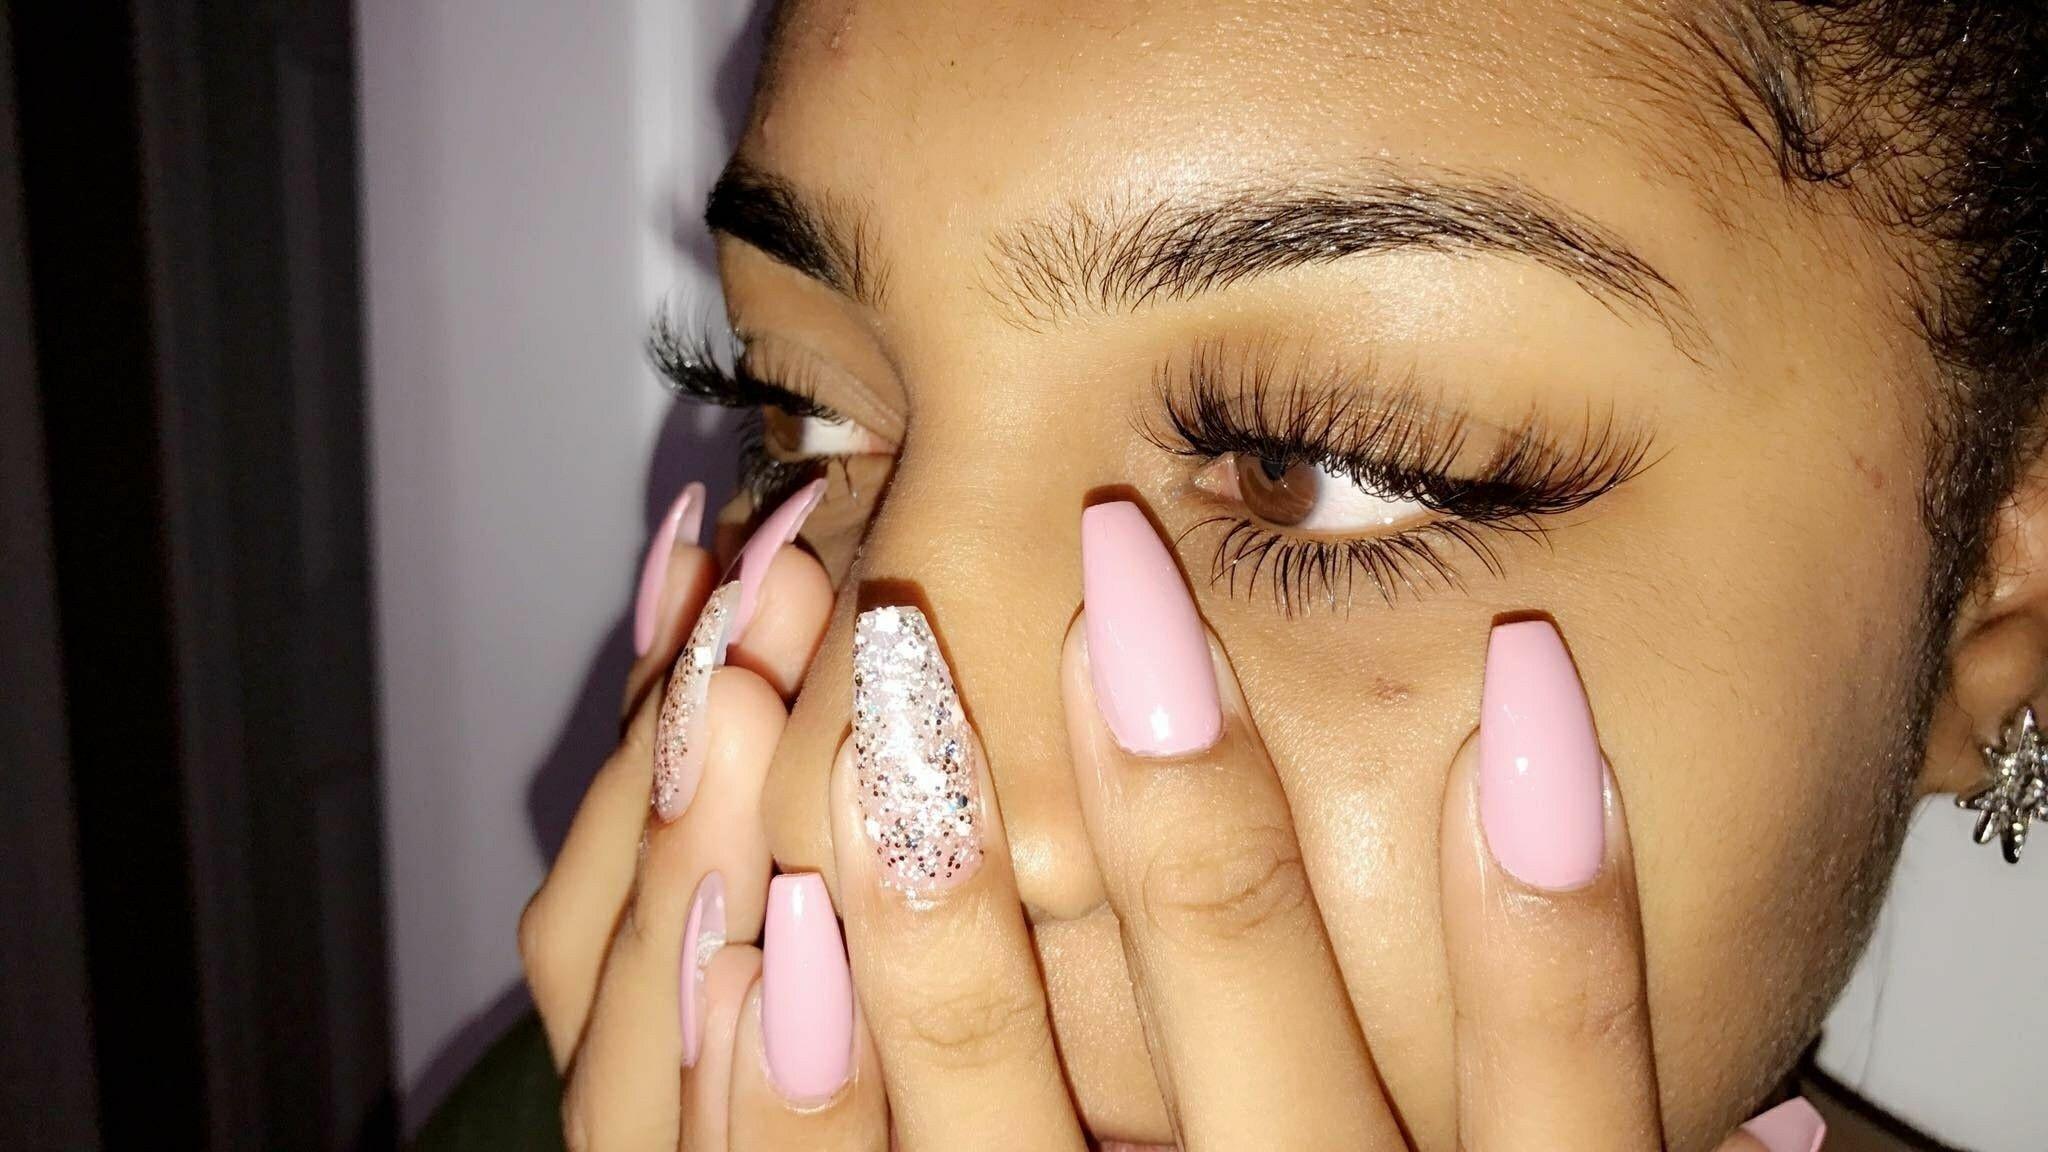 Pin by jayk466 on Bodycare Lashes, Eye makeup, Eyelash